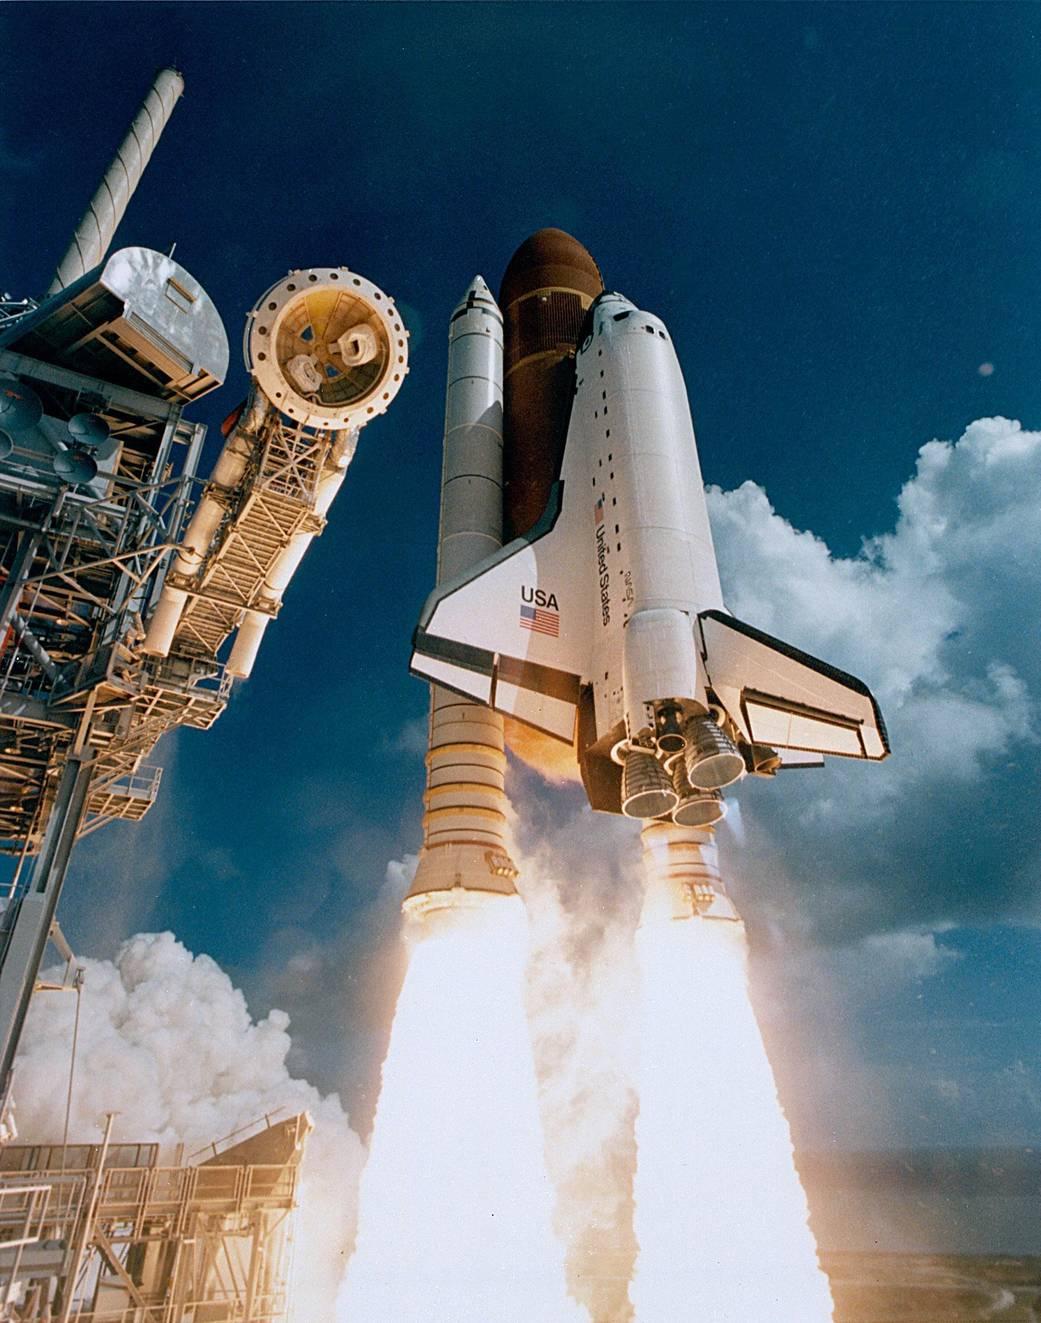 Maiden launch of Shuttle Atlantis. Photo courtesy of NASA.